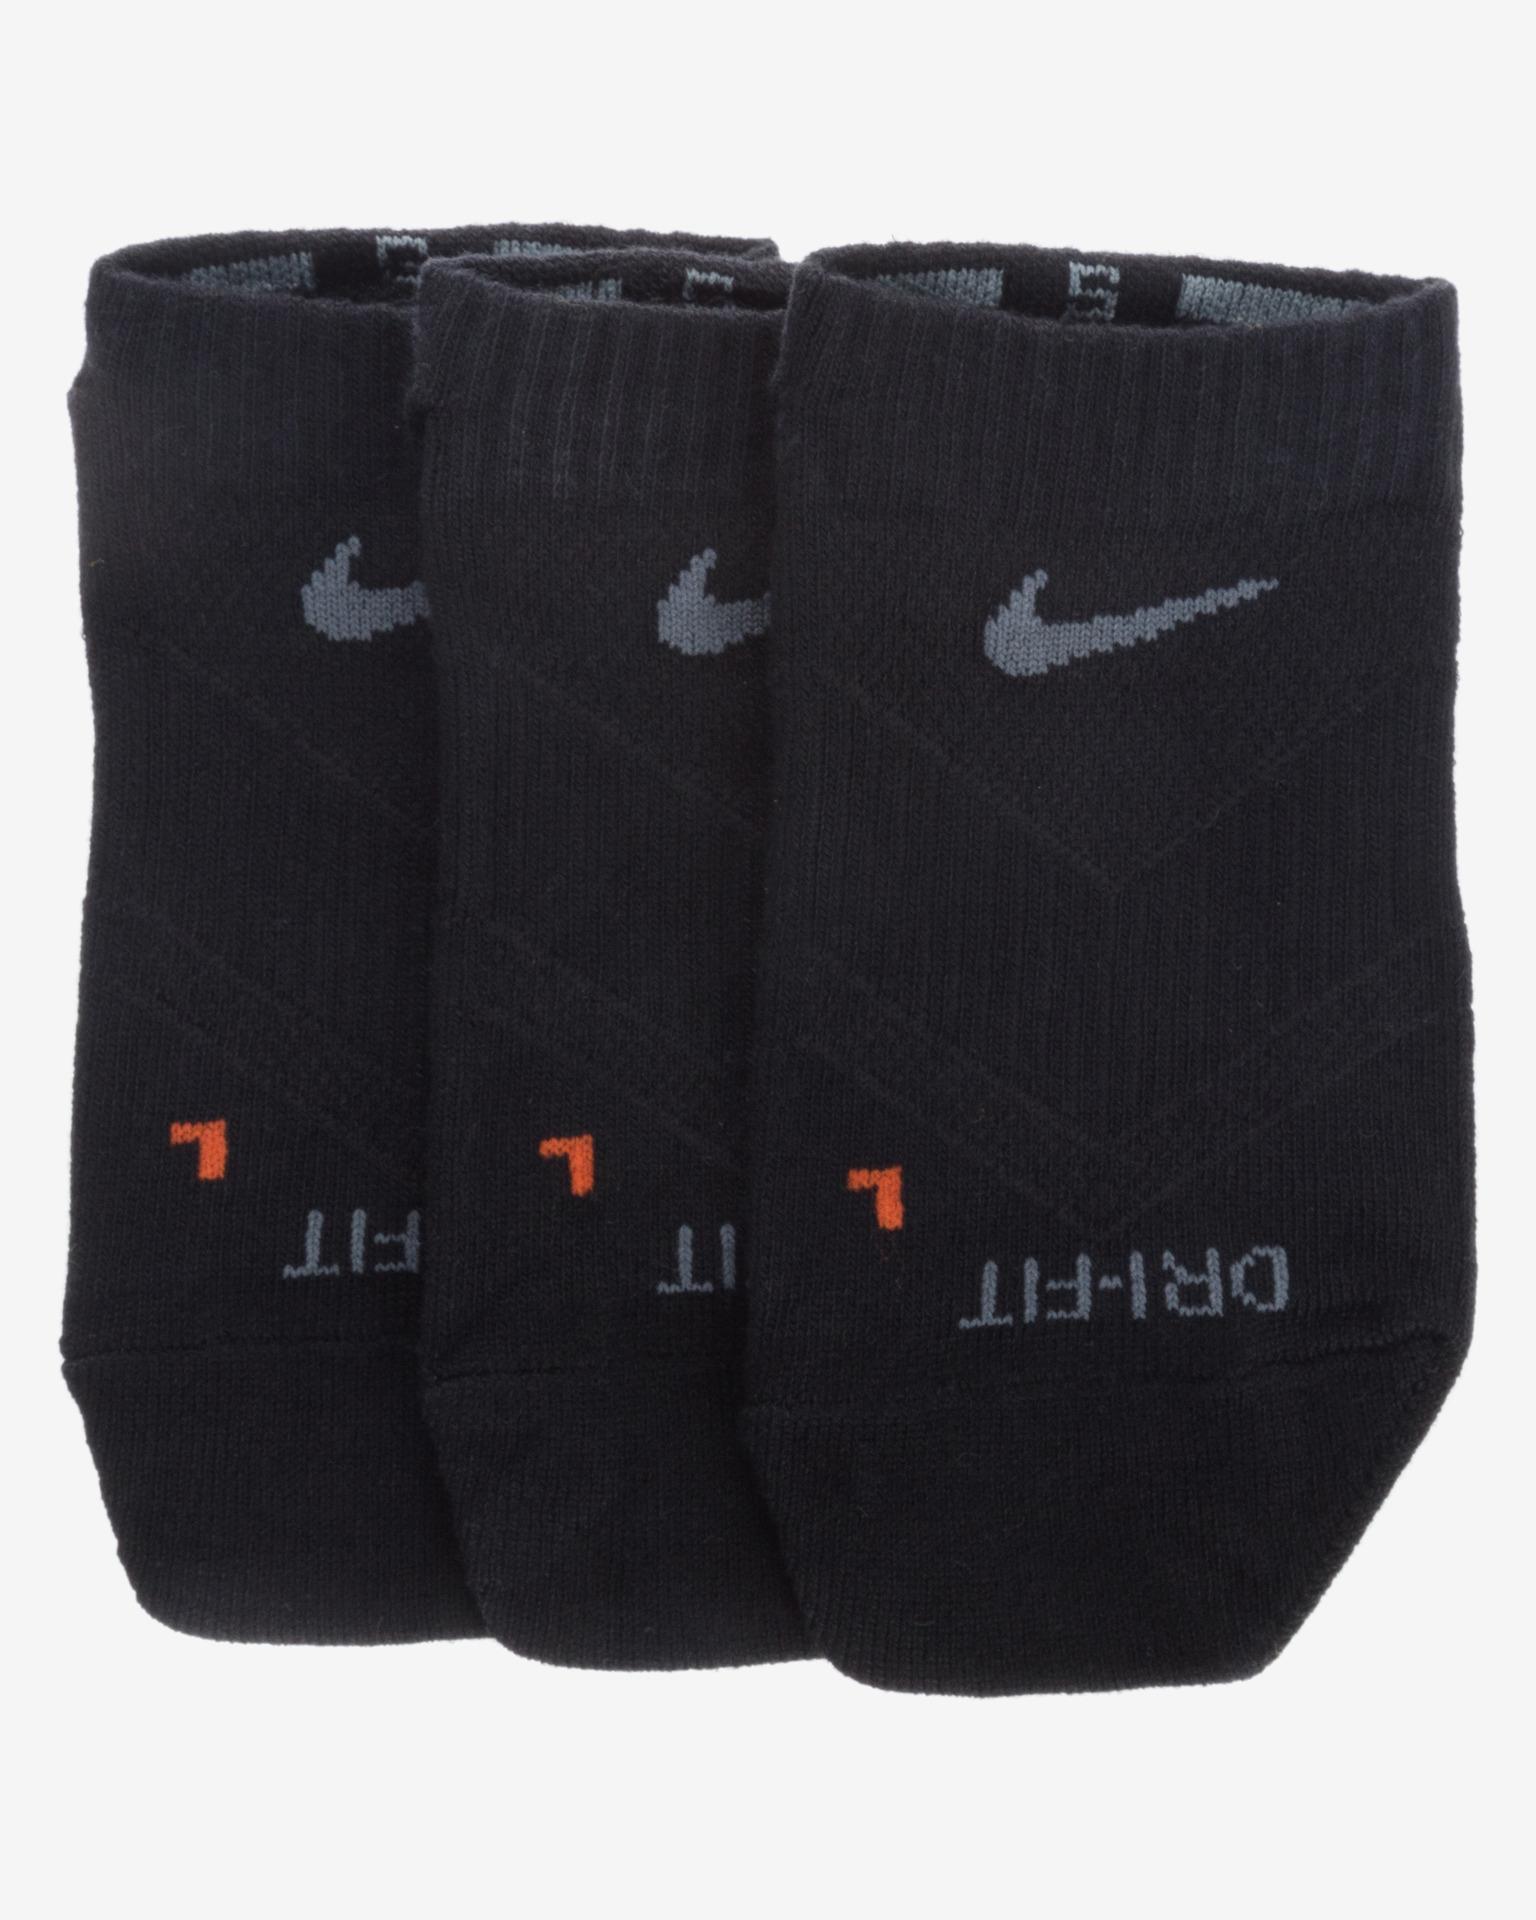 0706649b32 Nike - Ponožky 3 páry